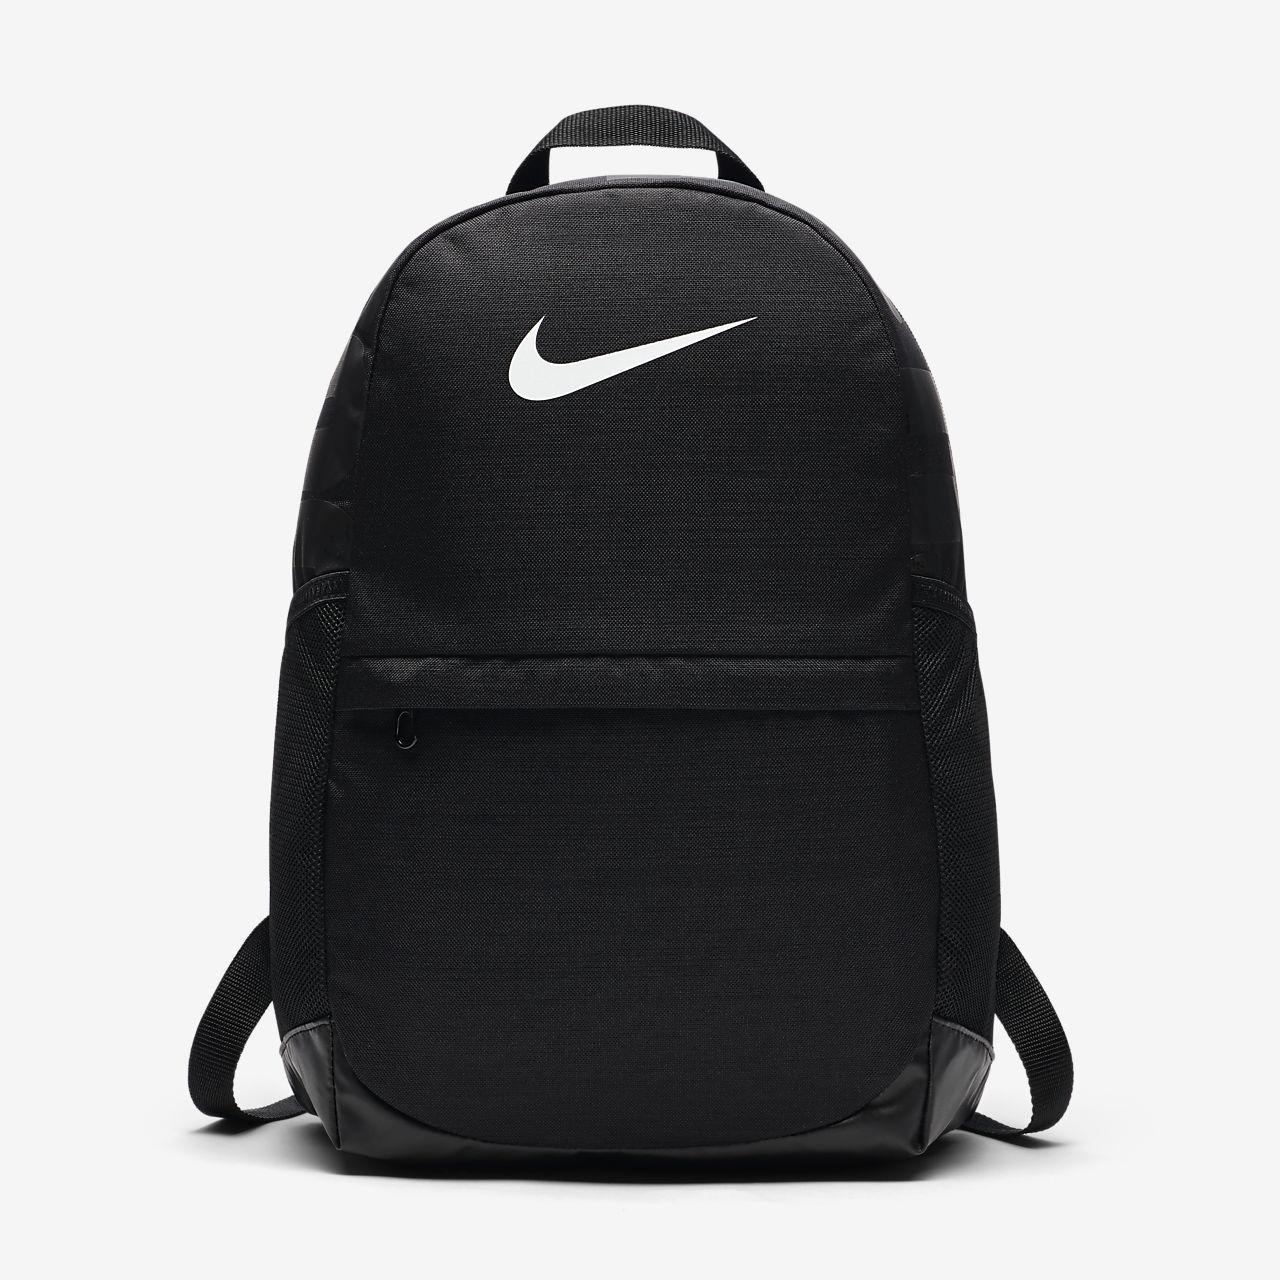 24b4bacec Nike Brasilia Mochila - Niño/a. Nike.com ES